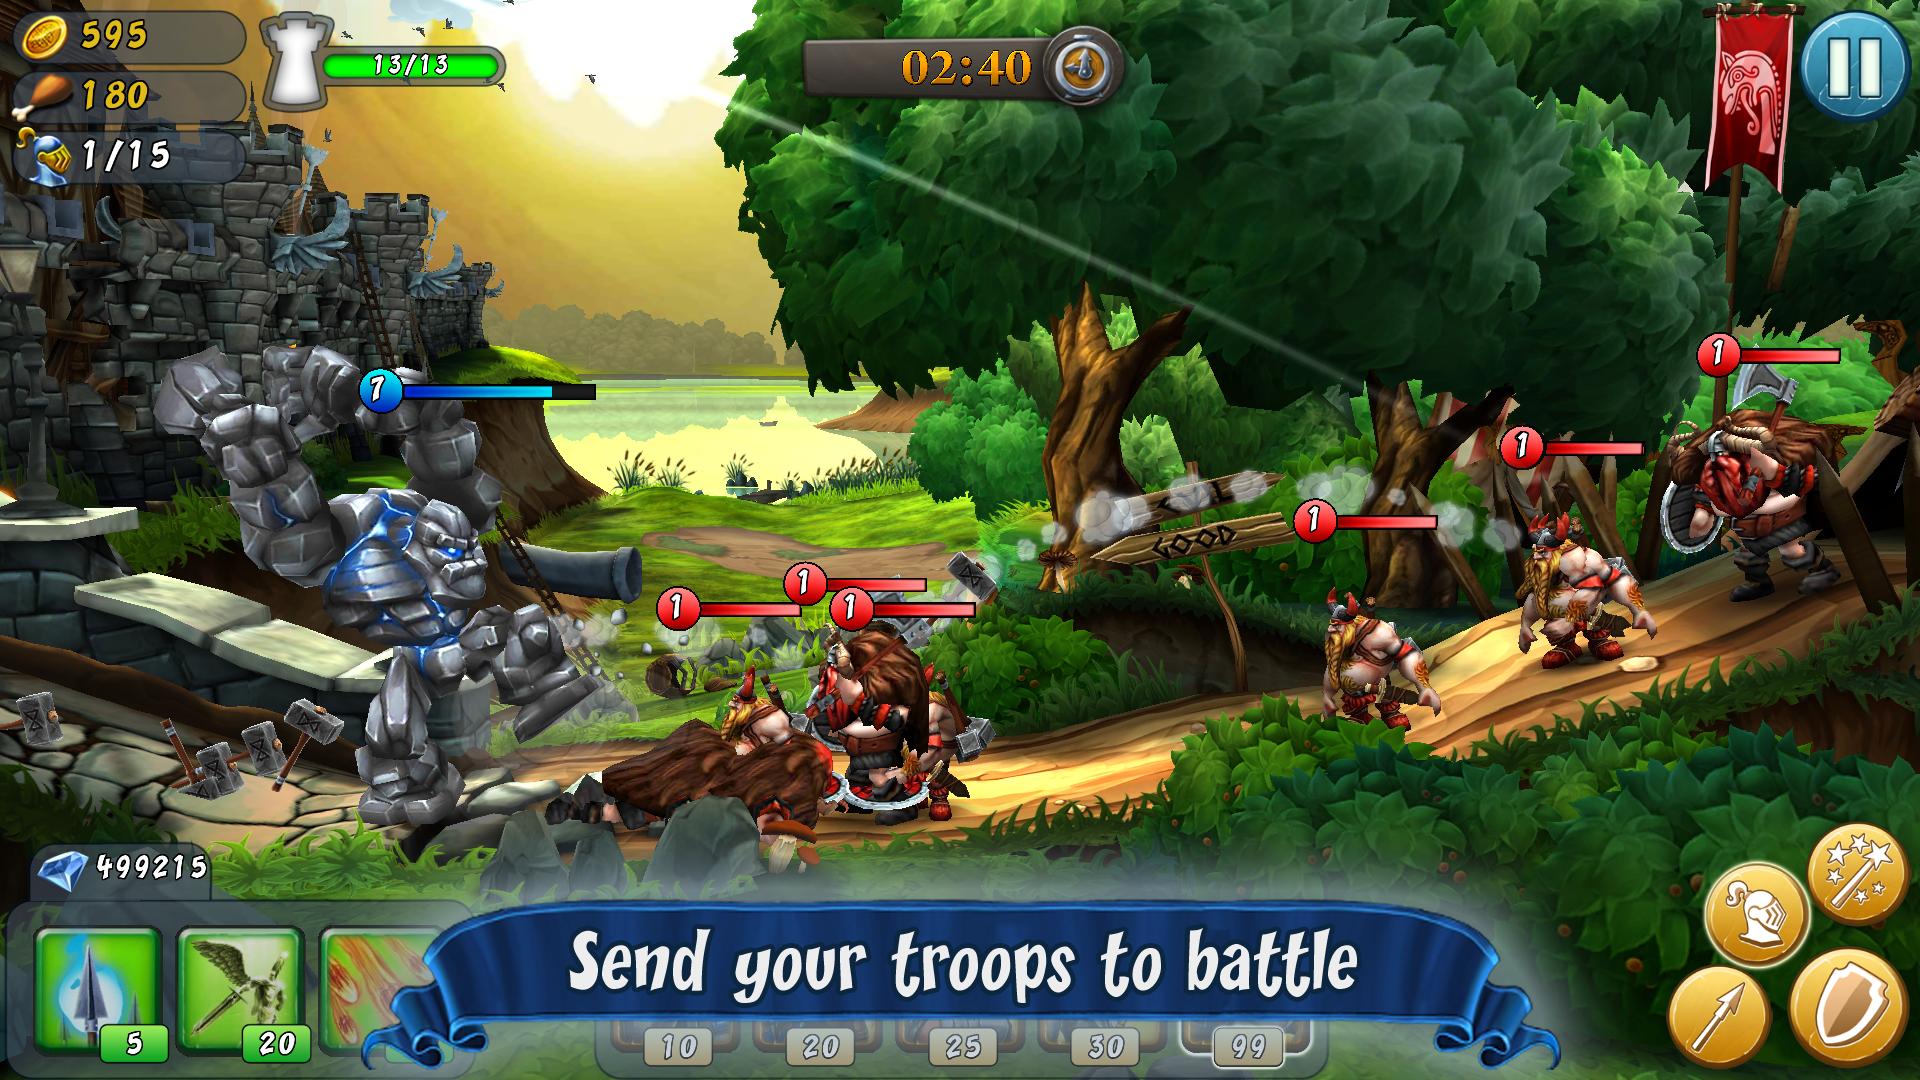 CastleStorm - Free to Siege screenshot #13